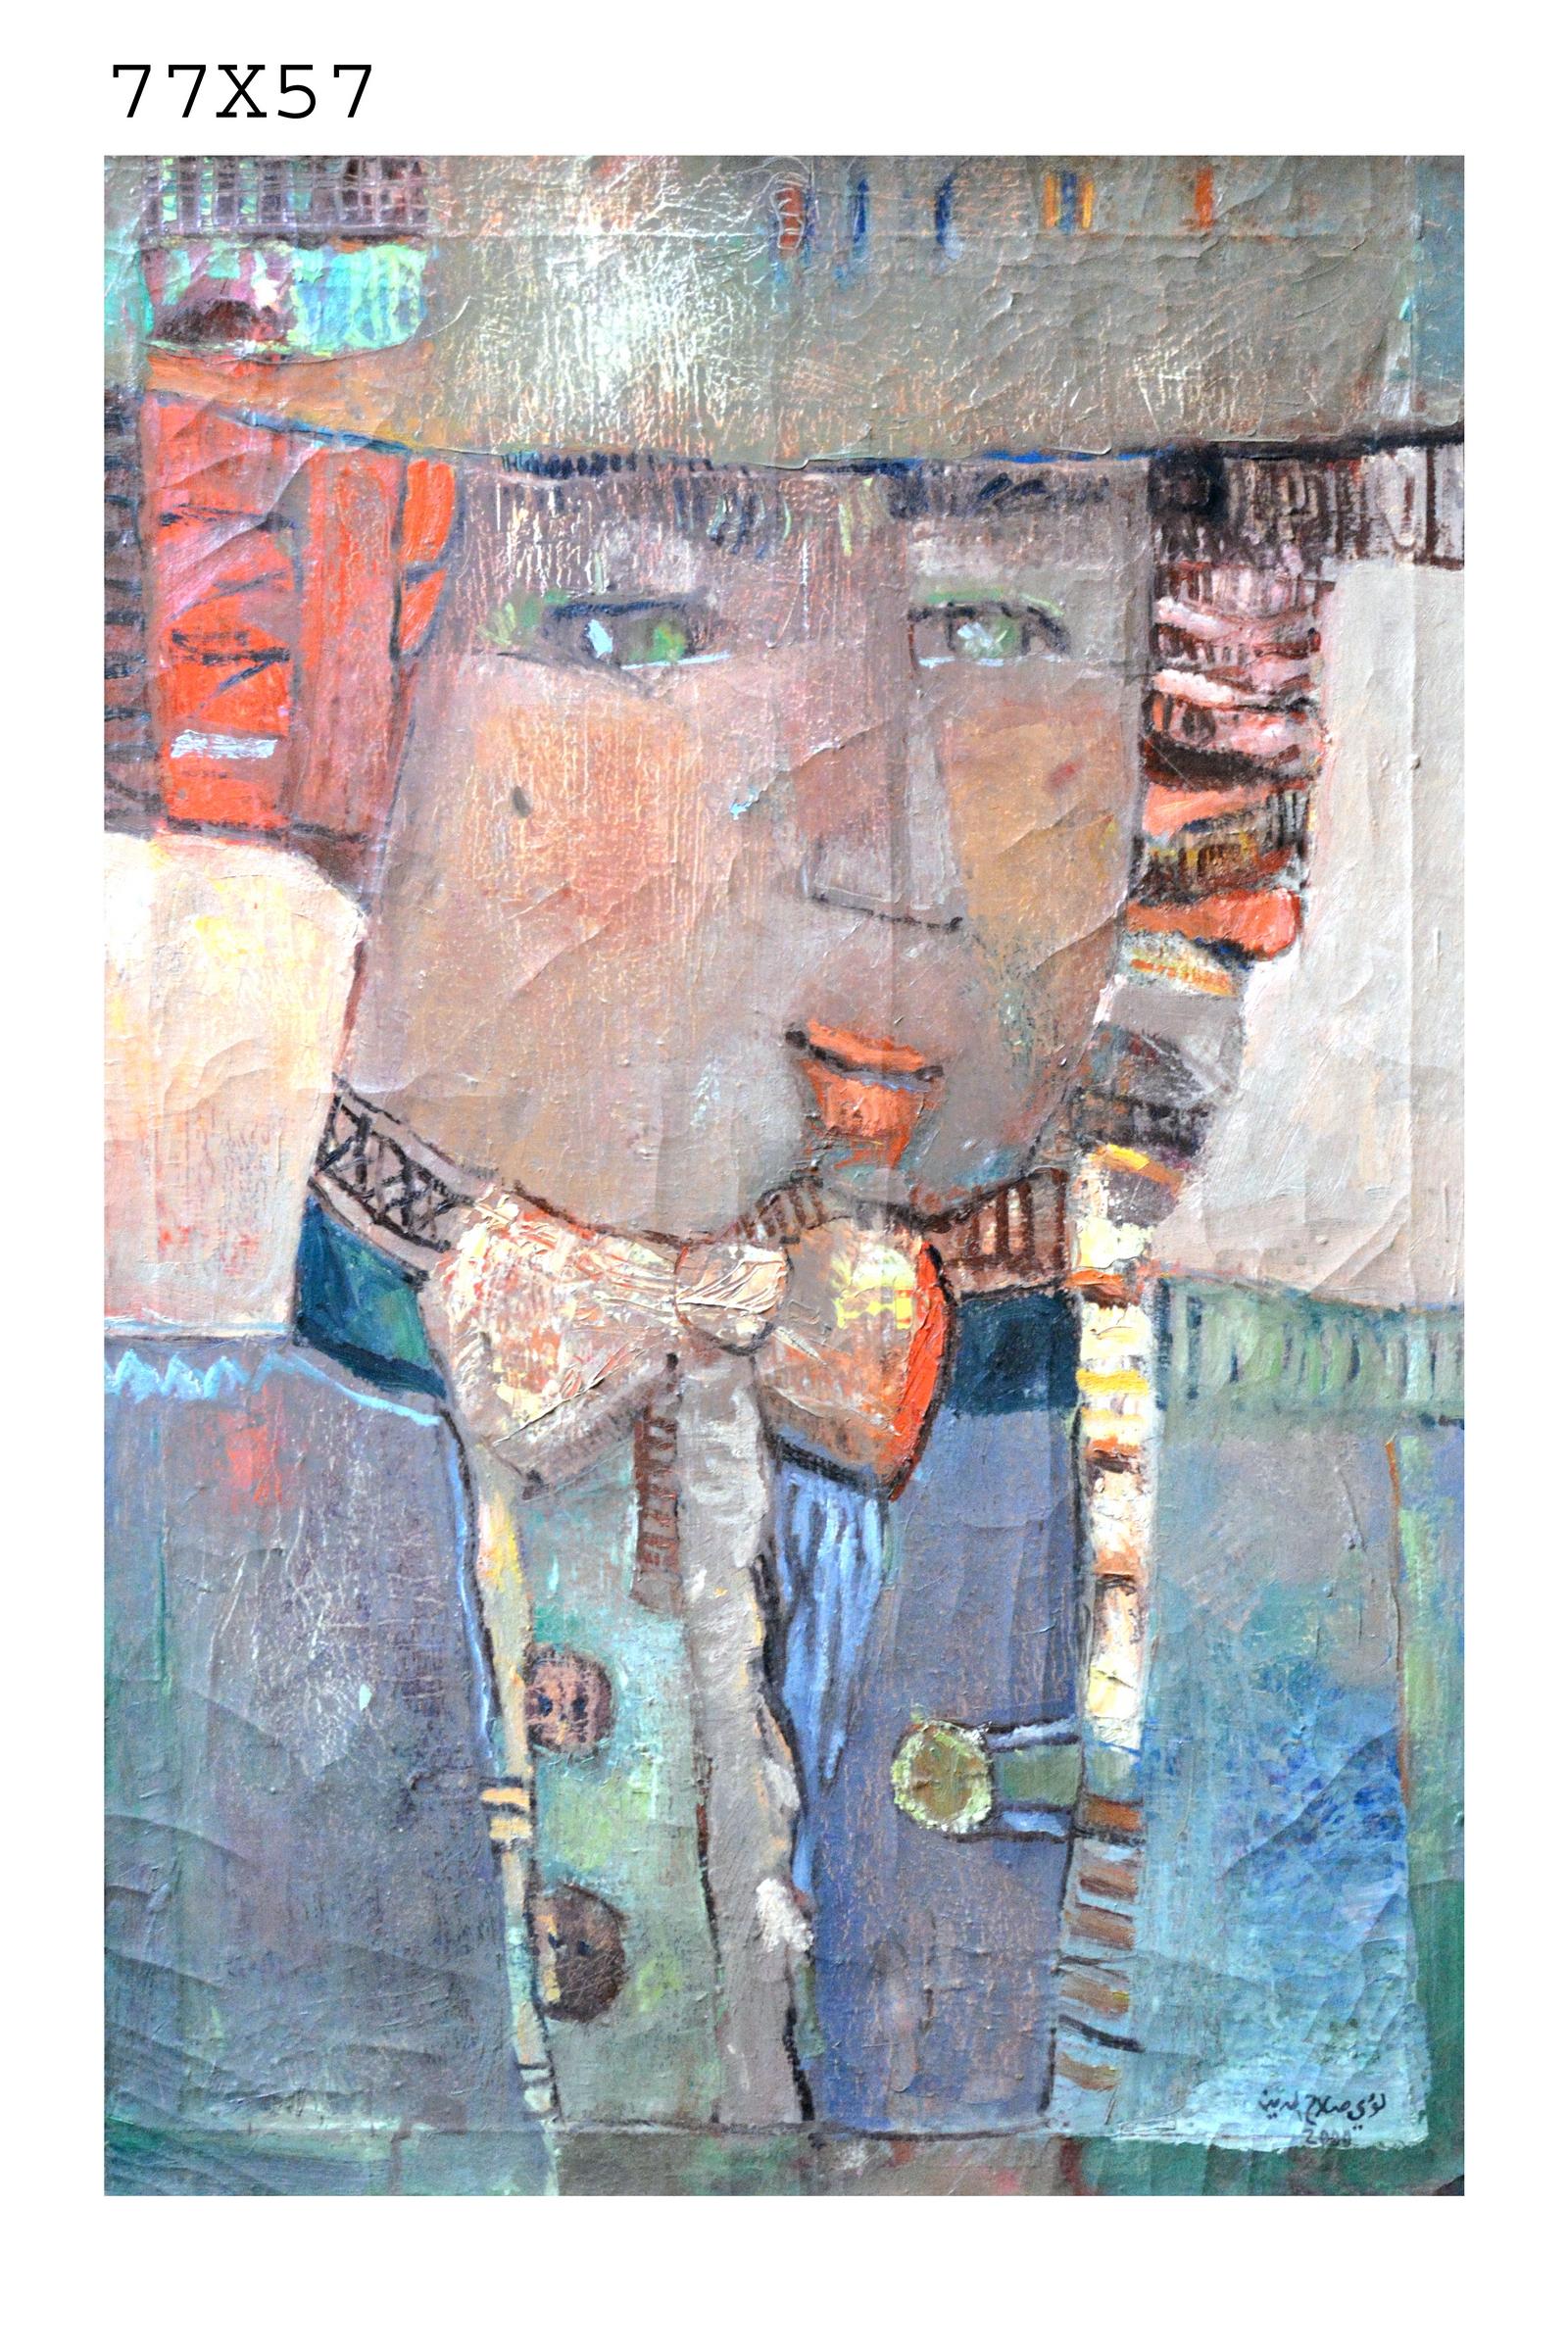 015_28 - Artist loai salahedeen 77 in 57 oil on canvas -الفنان لؤي صلاح الدين.JPG